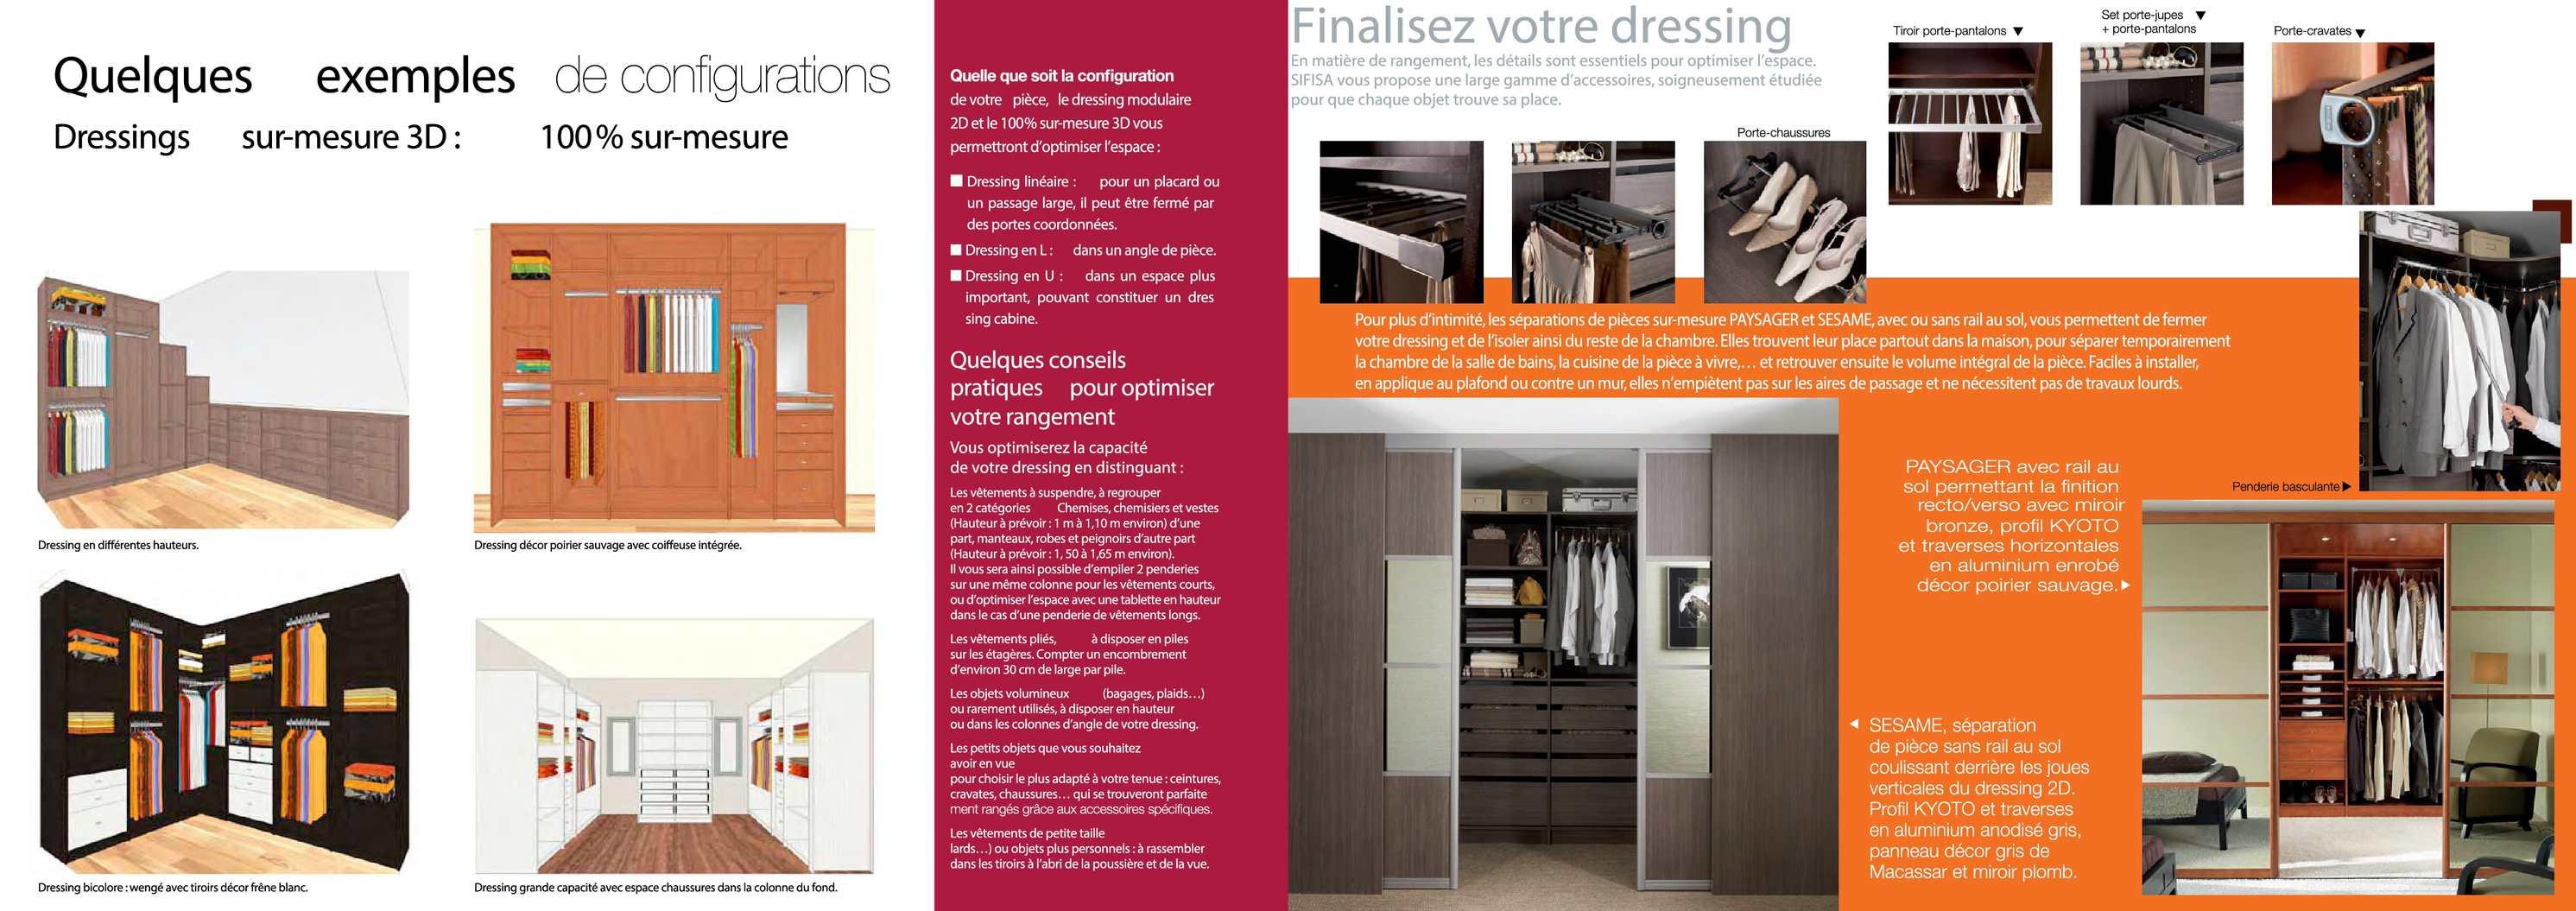 Dressing Avec Coiffeuse Intégrée aksess cuisine - calameo downloader